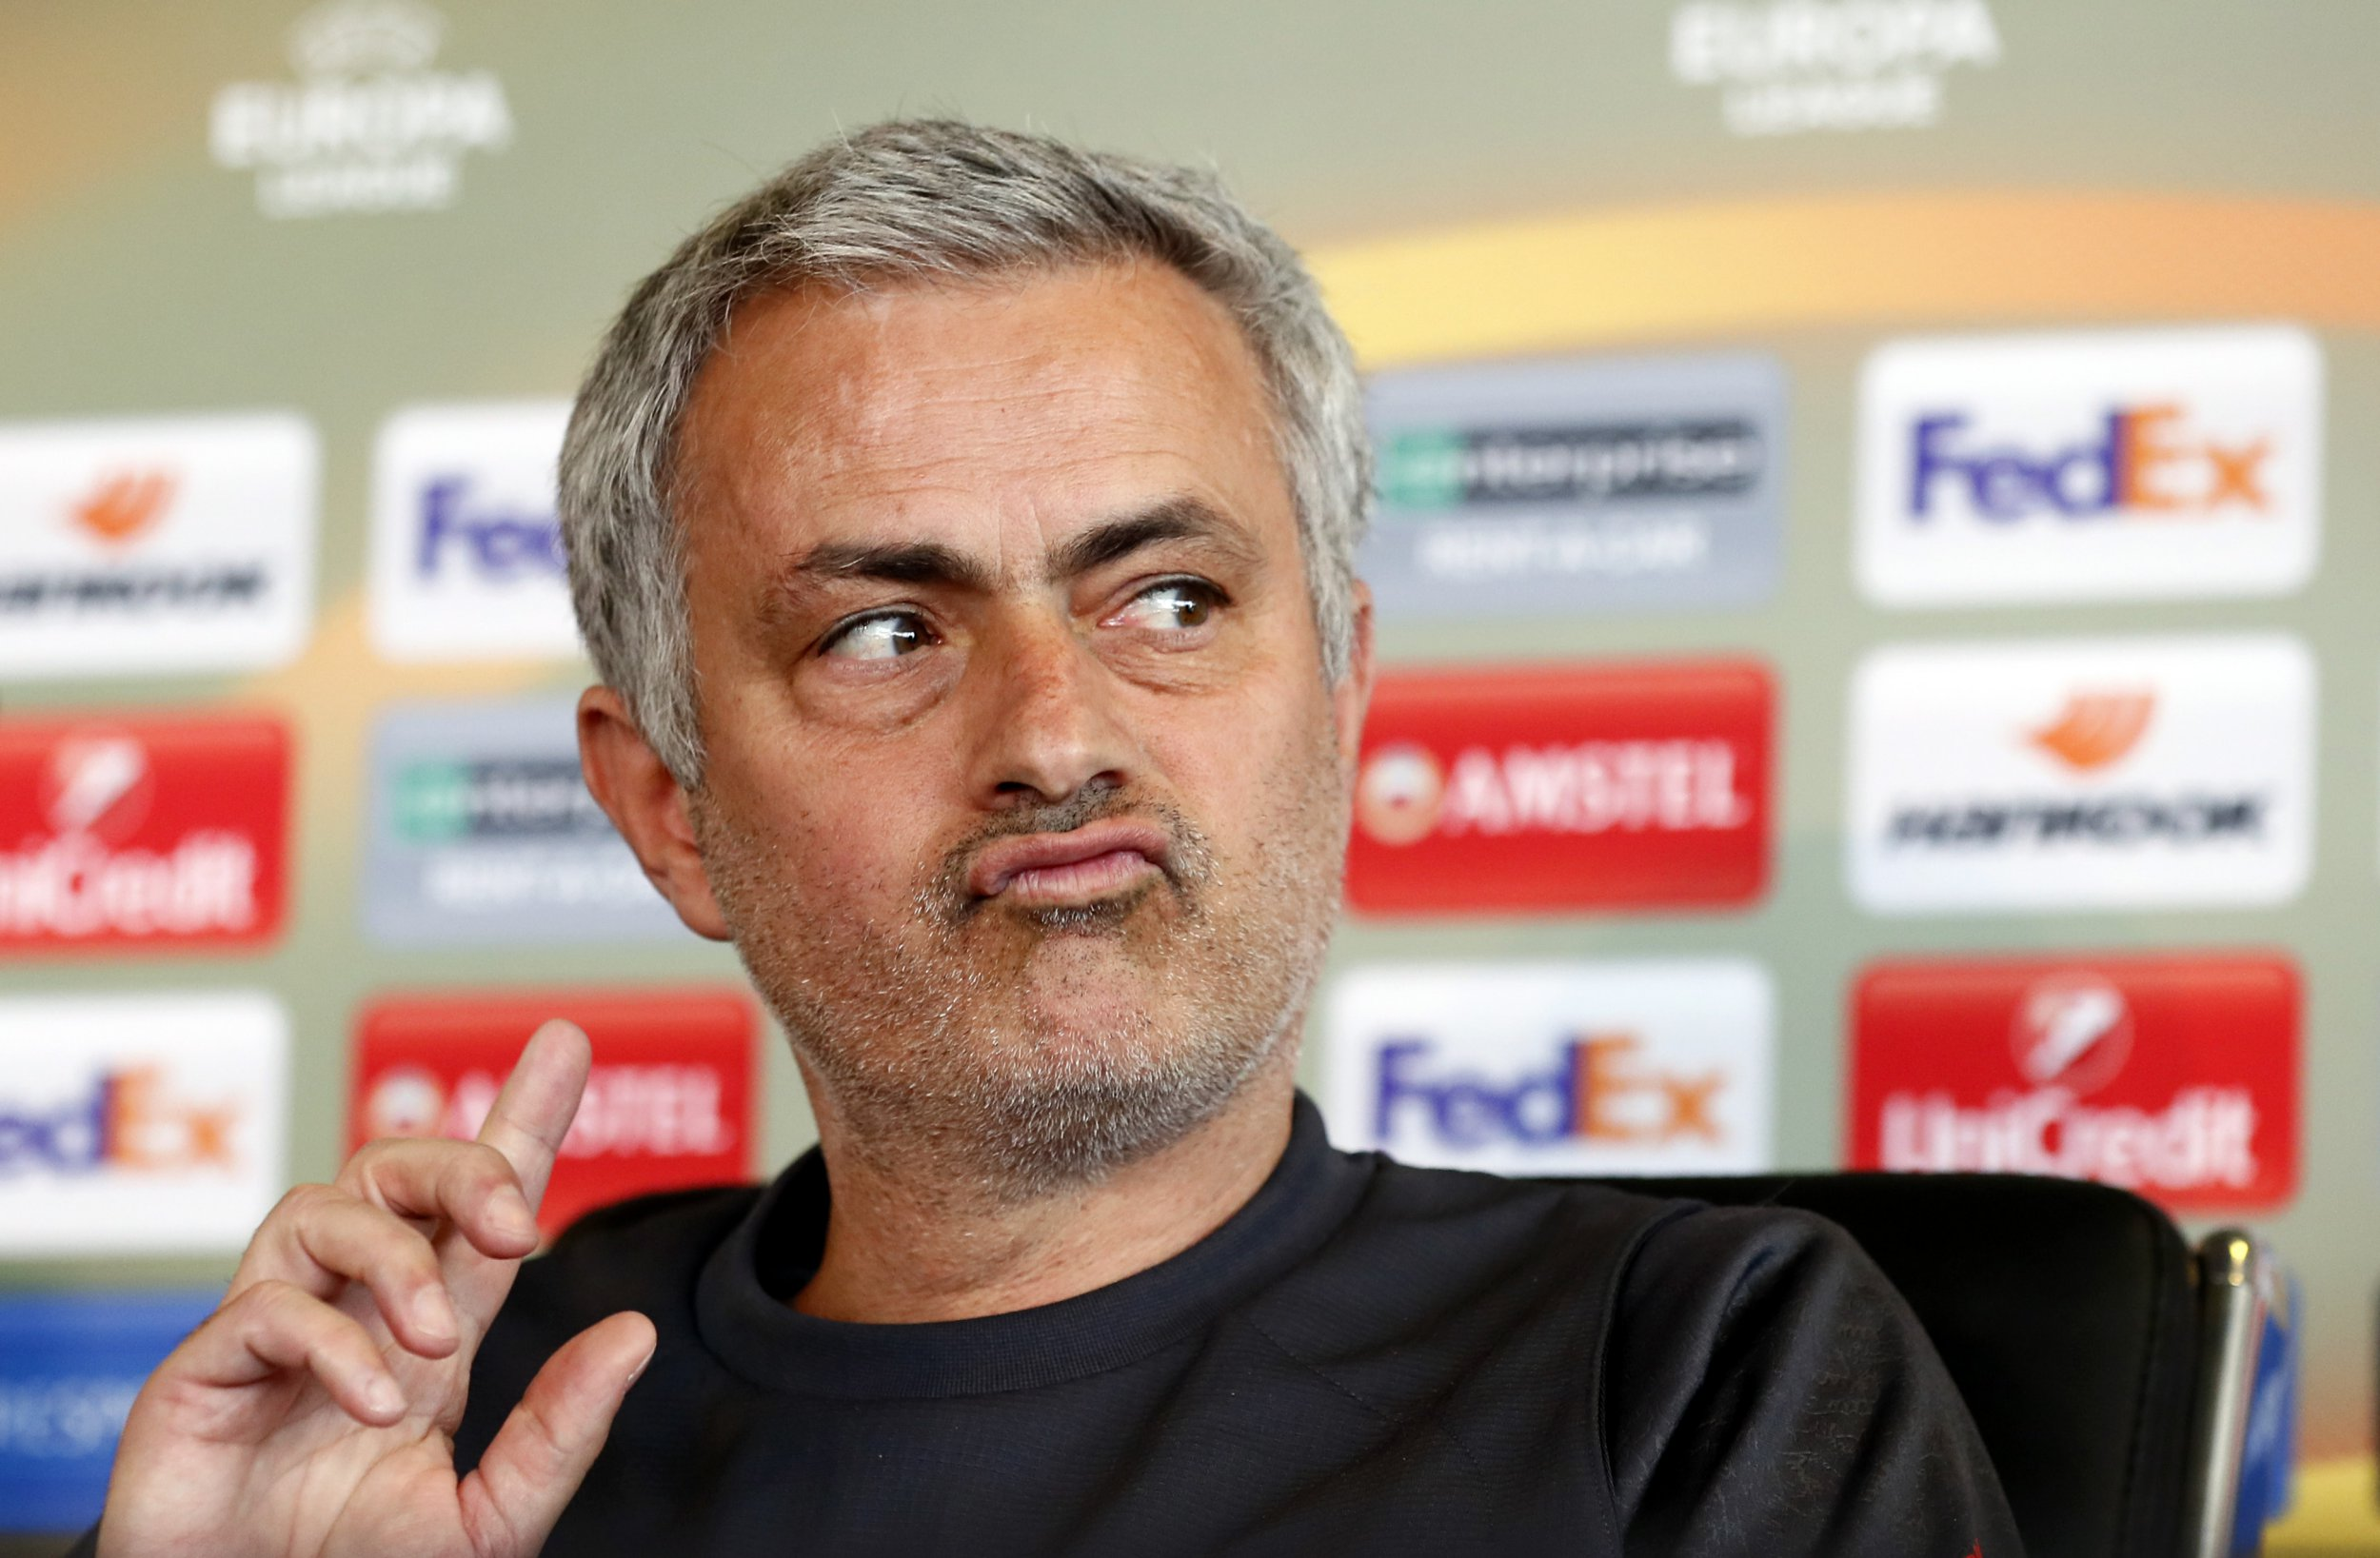 Jose Mourinho wants Joe Hart as David De Gea's replacement at Manchester United